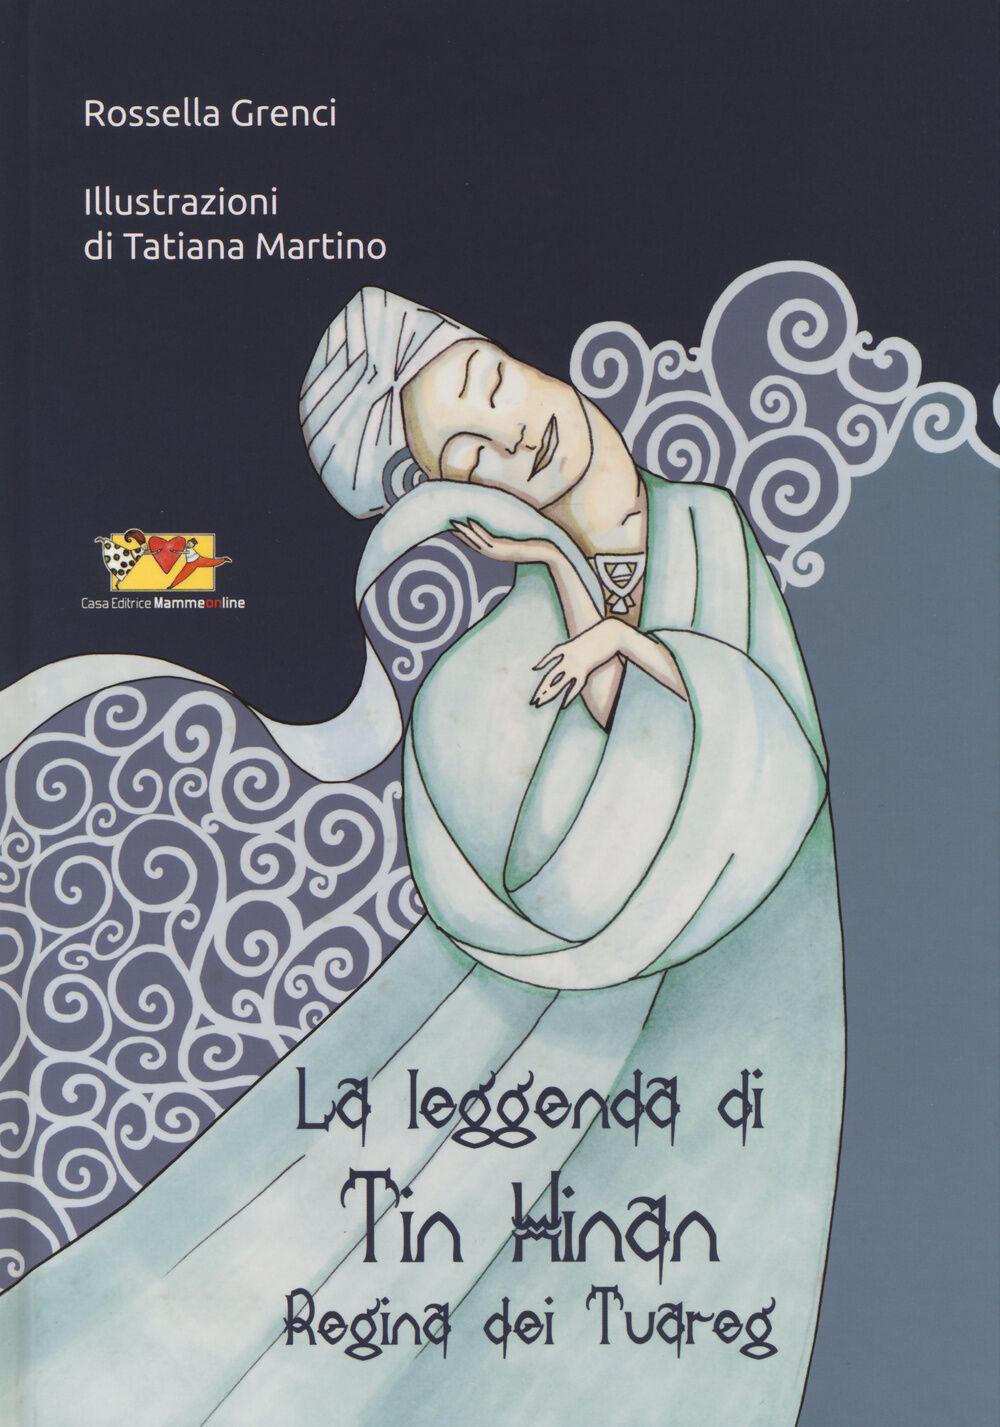 La leggenda di Tin Hinan regina dei tuareg